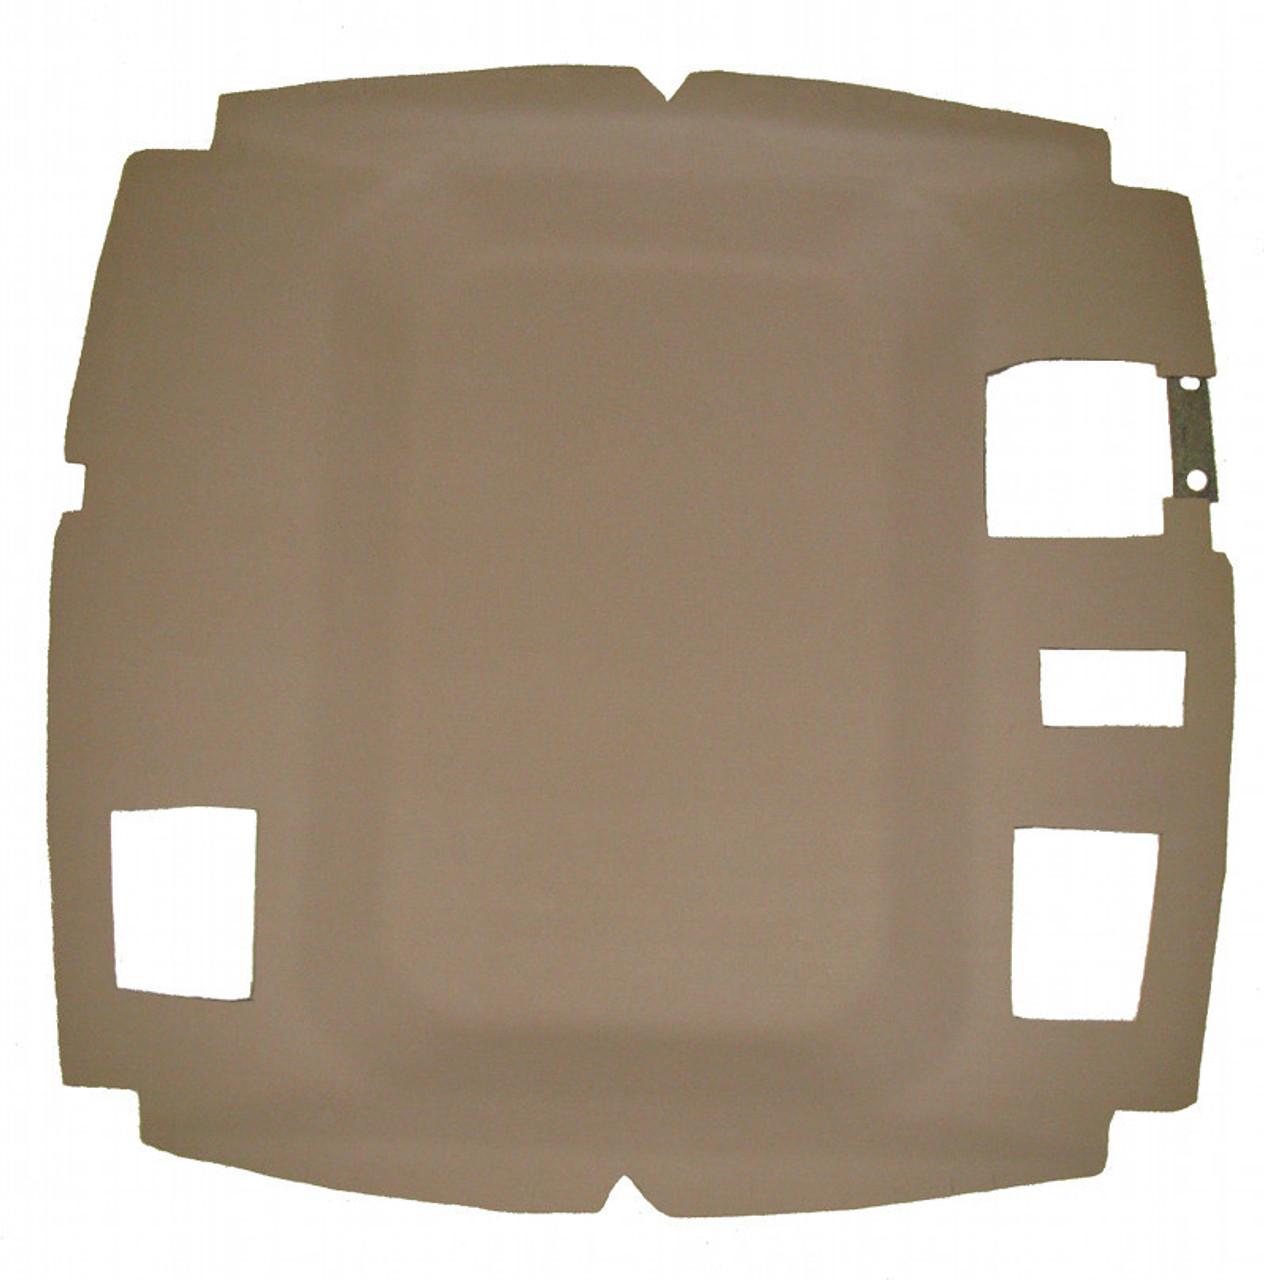 medium resolution of  5420 headliner for john deere 6000 series tractor interior upholstery on john deere 6420 wiring diagram